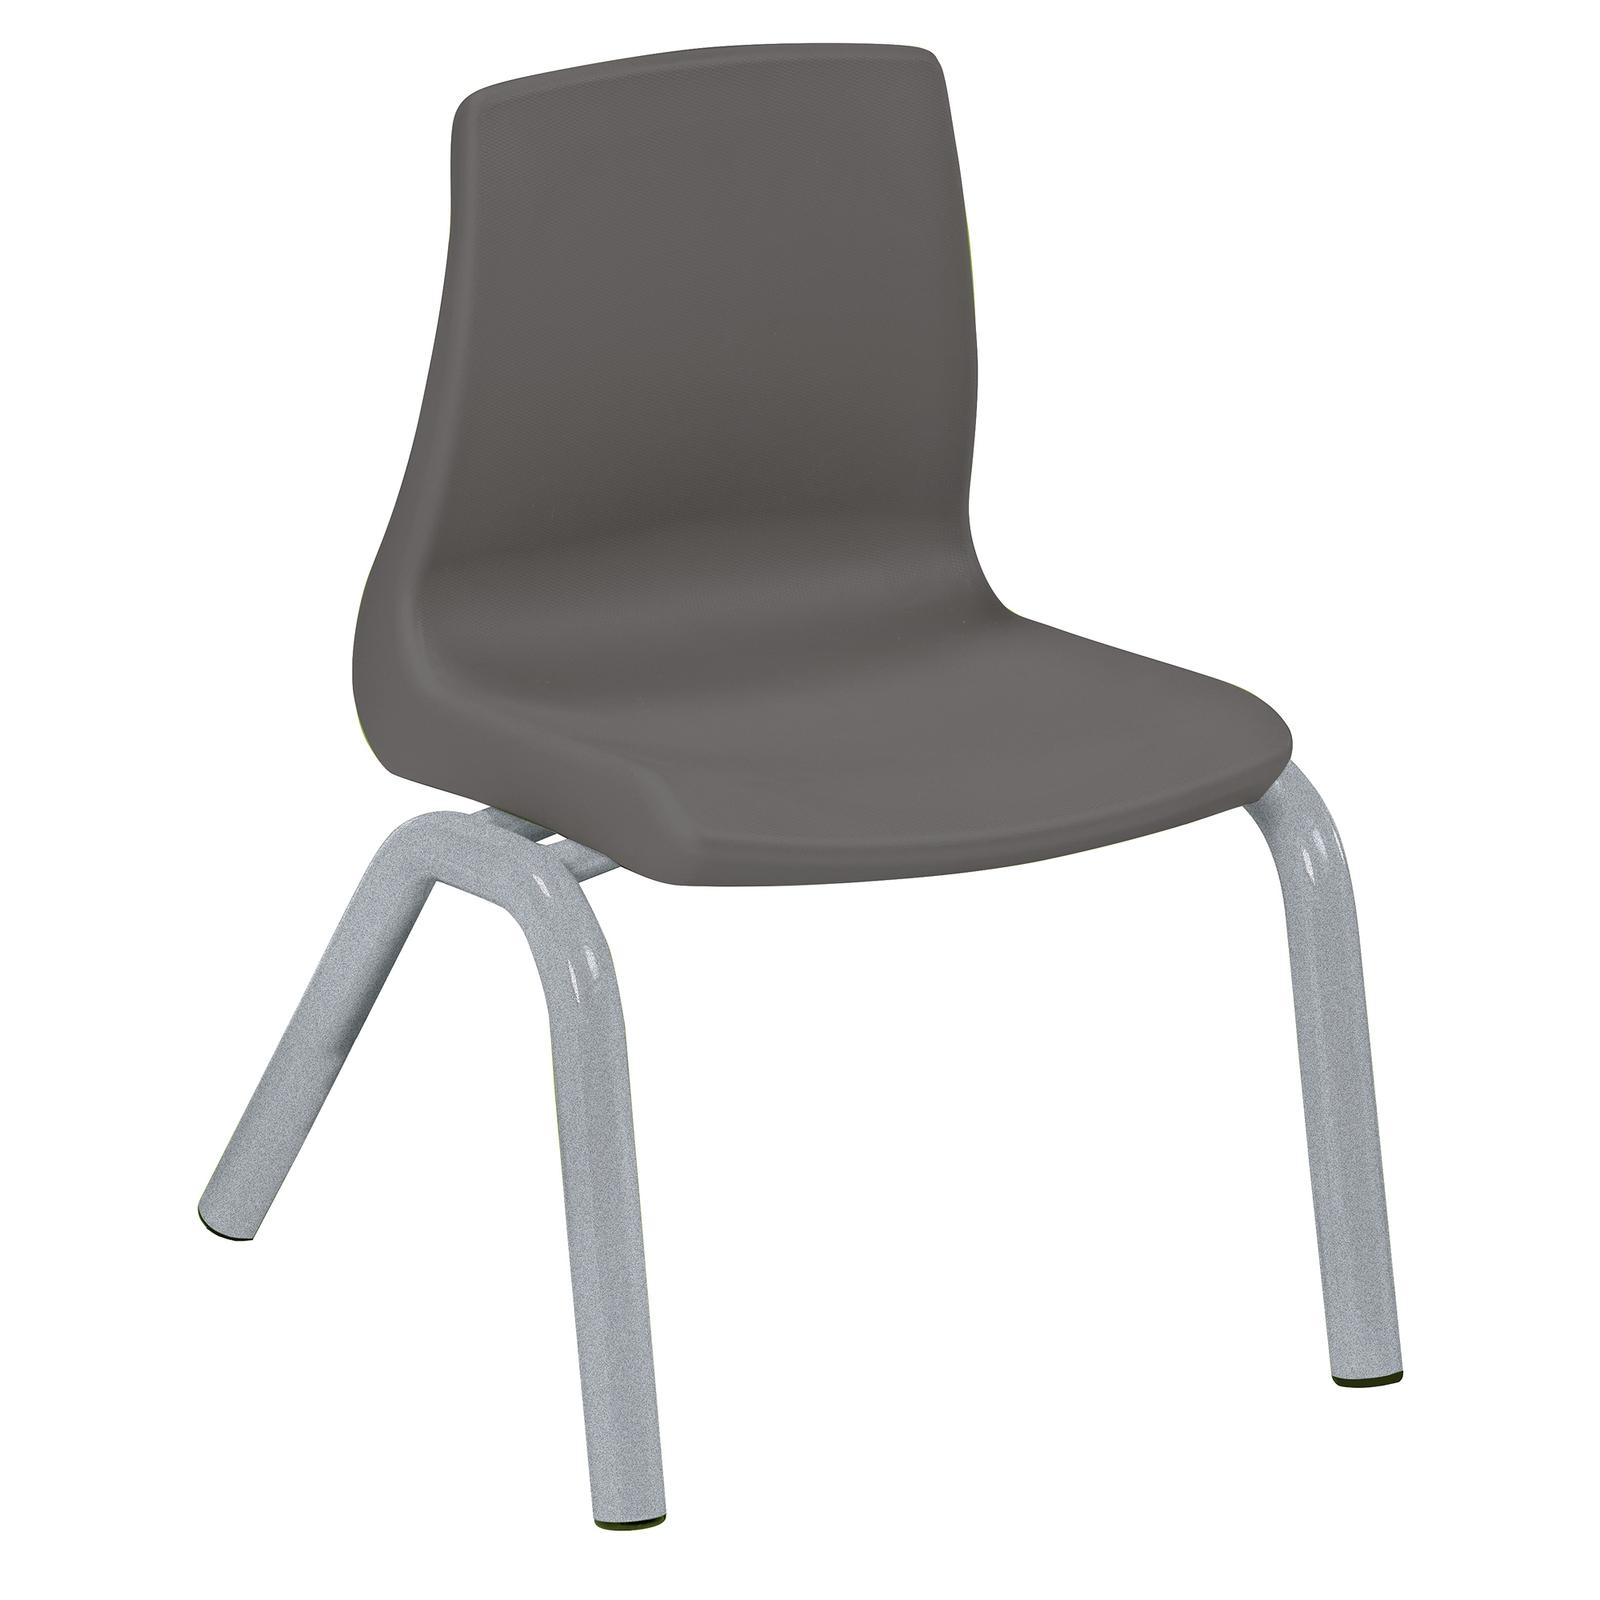 Harlequin Grey Chair 4-6 Years